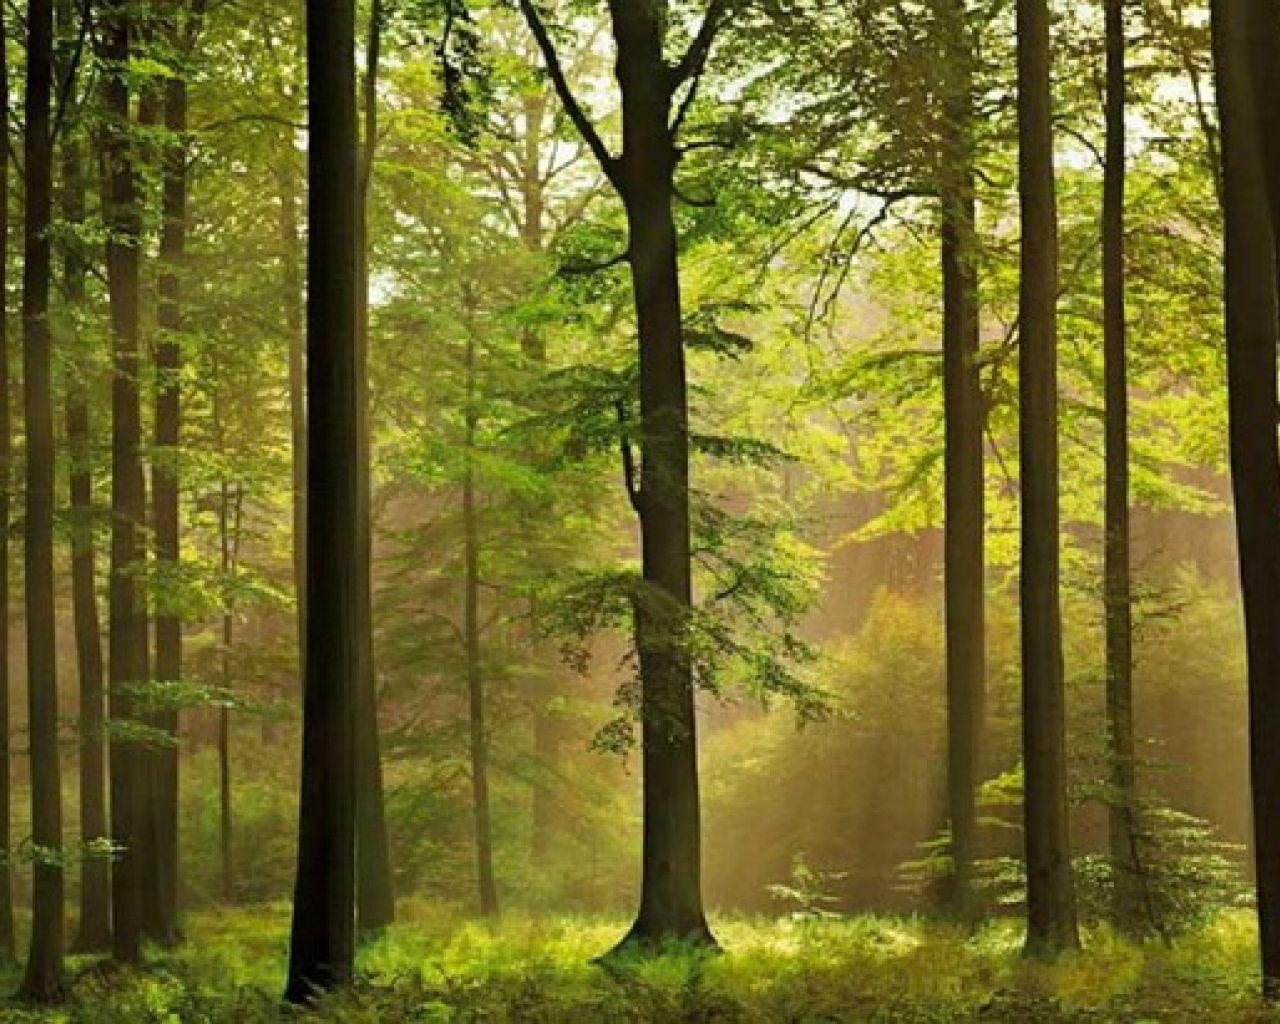 wallpaper-mural-forest-theme-traditional-wallpaper-versus-living ...